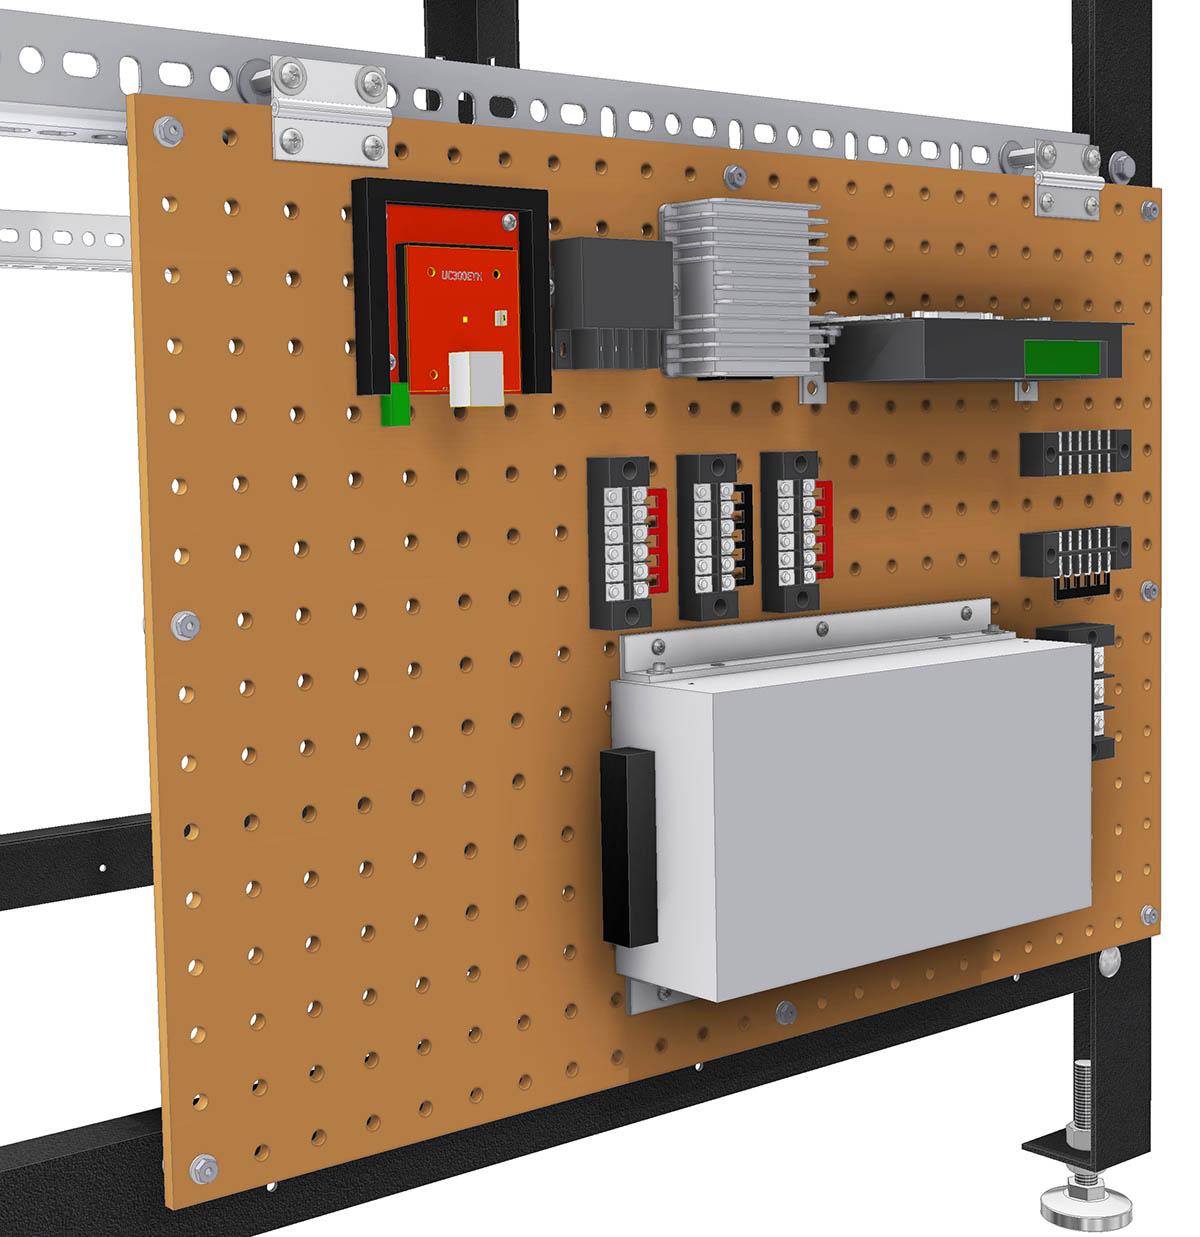 KRCCS full assembly V4 layout board 8.jpg